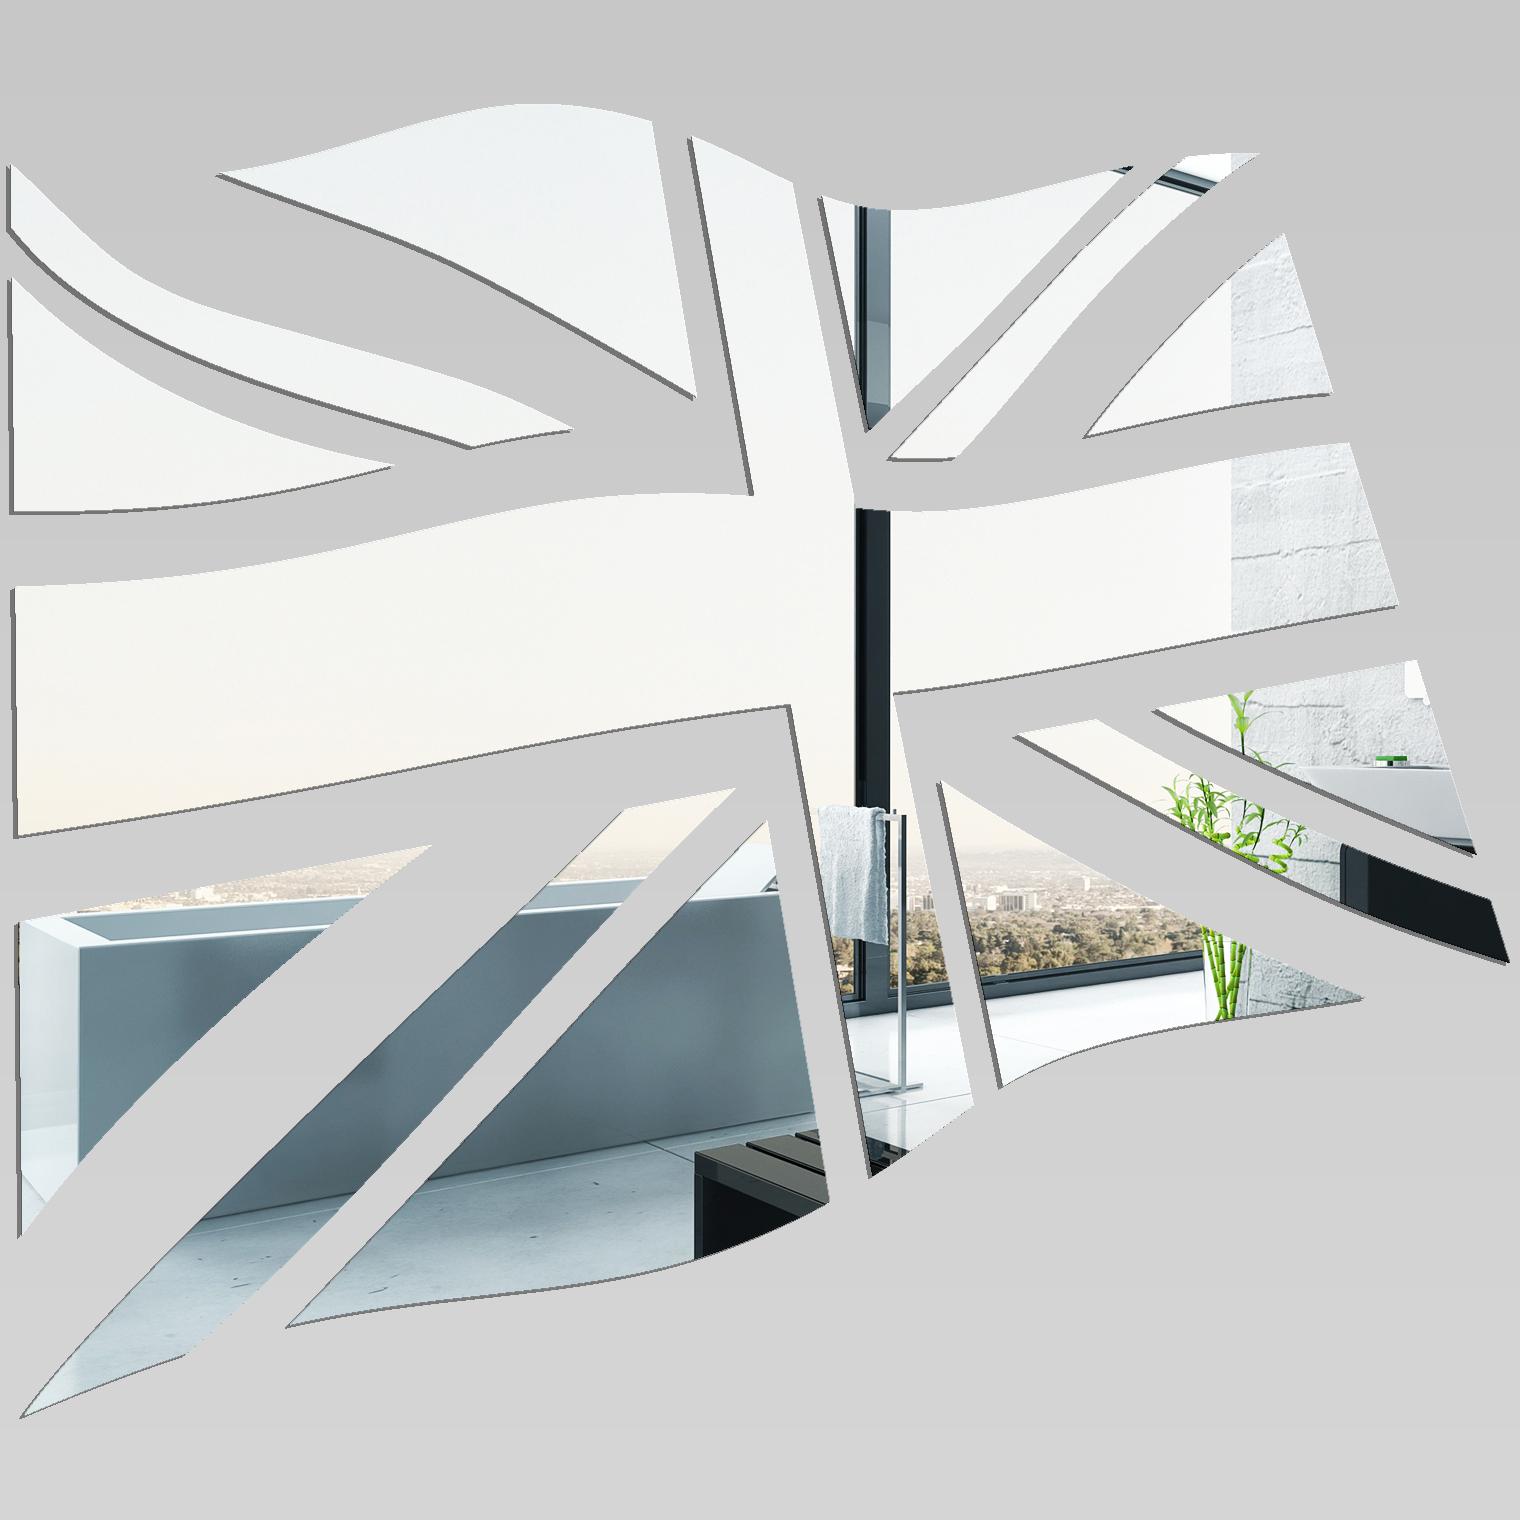 Miroir plexiglass acrylique drapeau anglais pas cher for Miroir acrylique